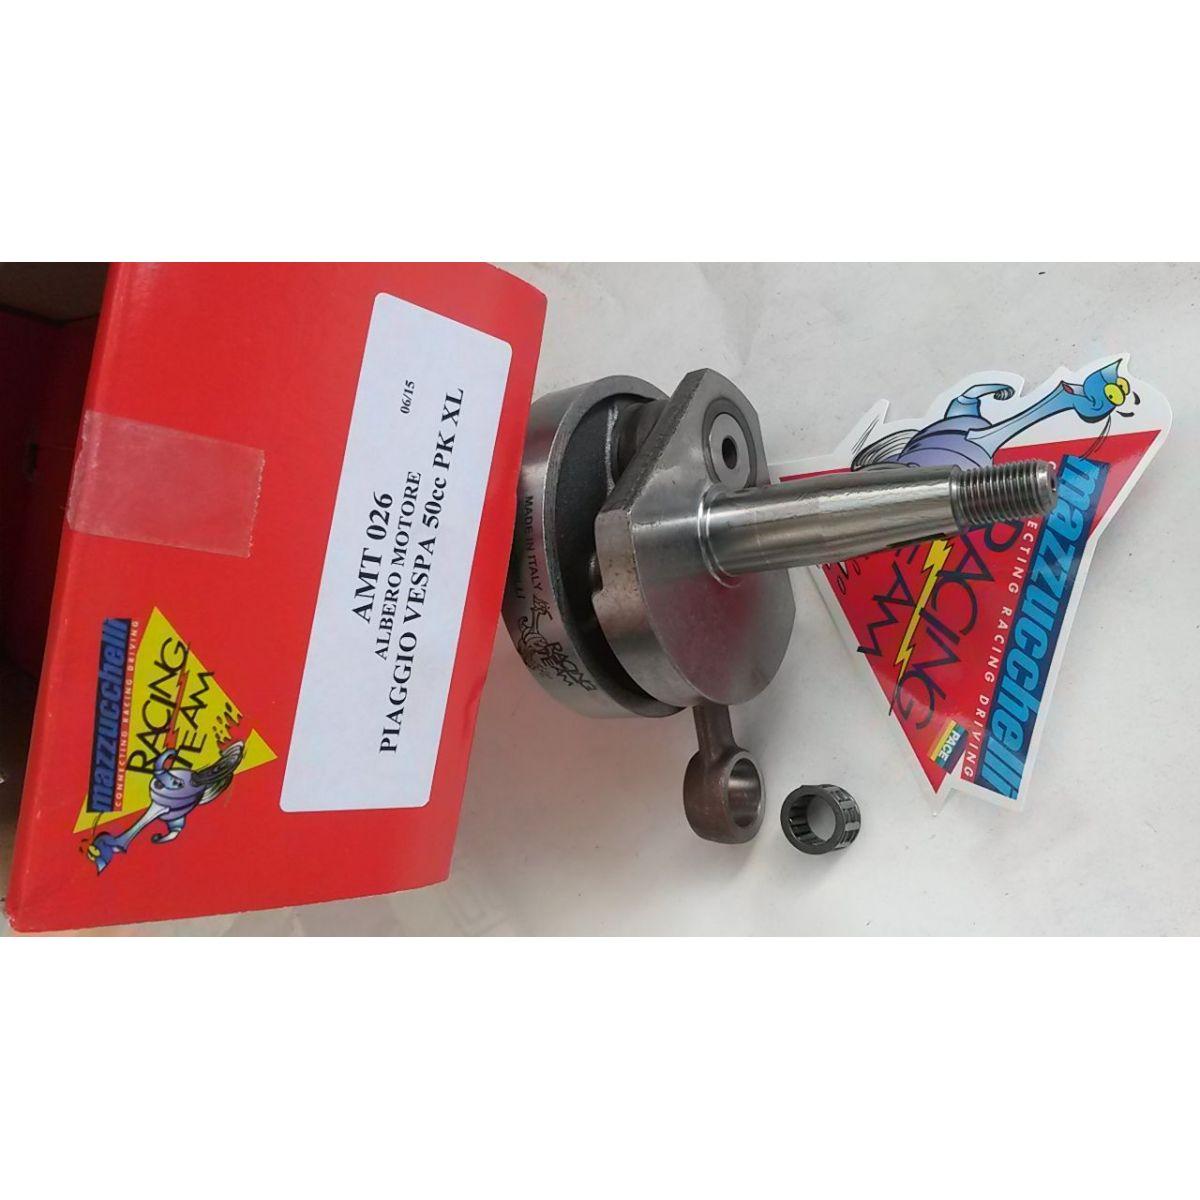 Albero motore mazzucchelli